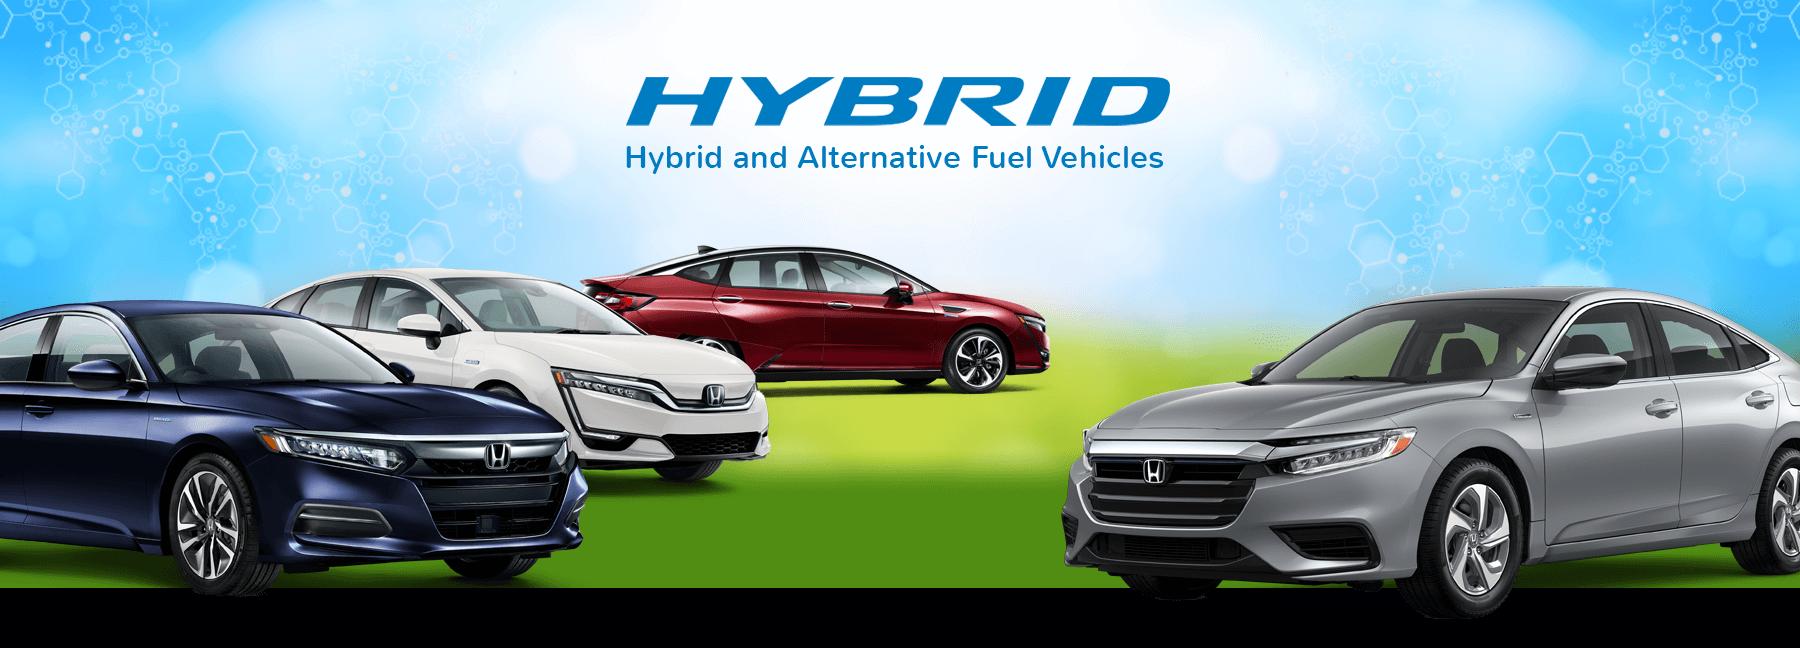 Honda Hybrid Cars and Alternative Fuel Vehicles Banner